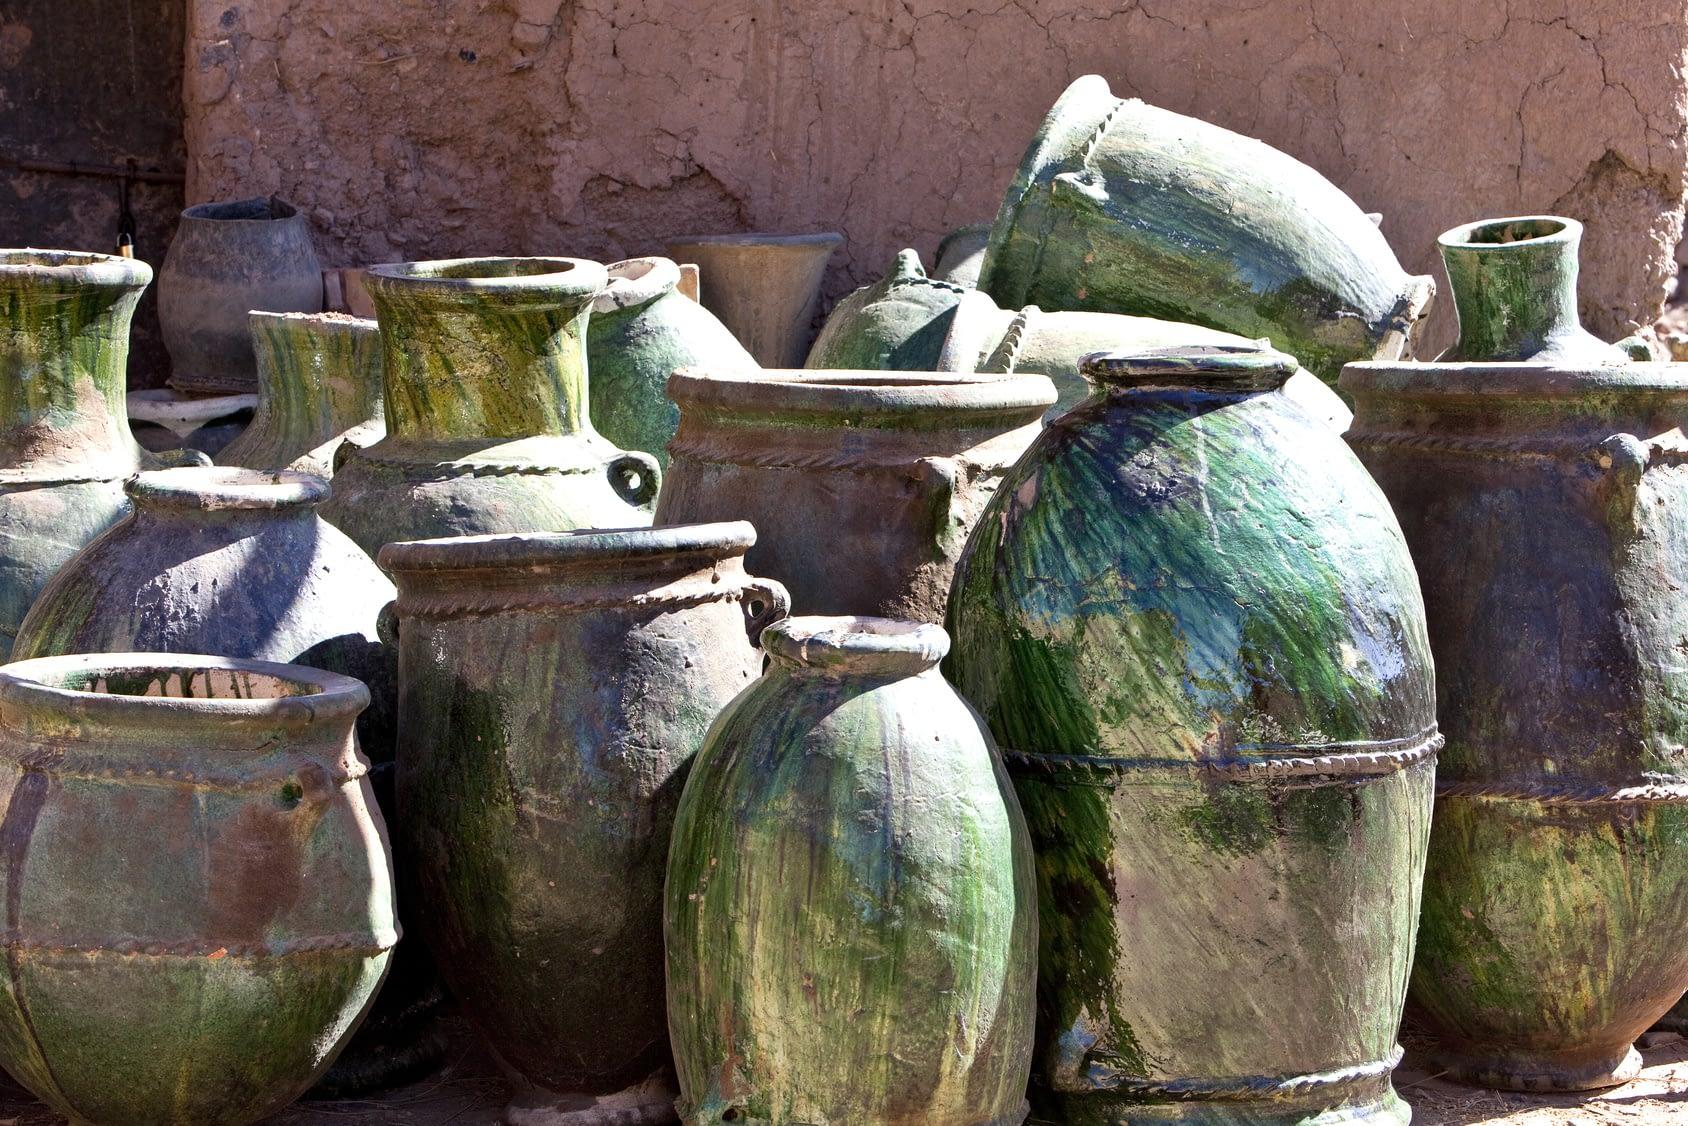 Keramik Tamegroute Pottery workshop